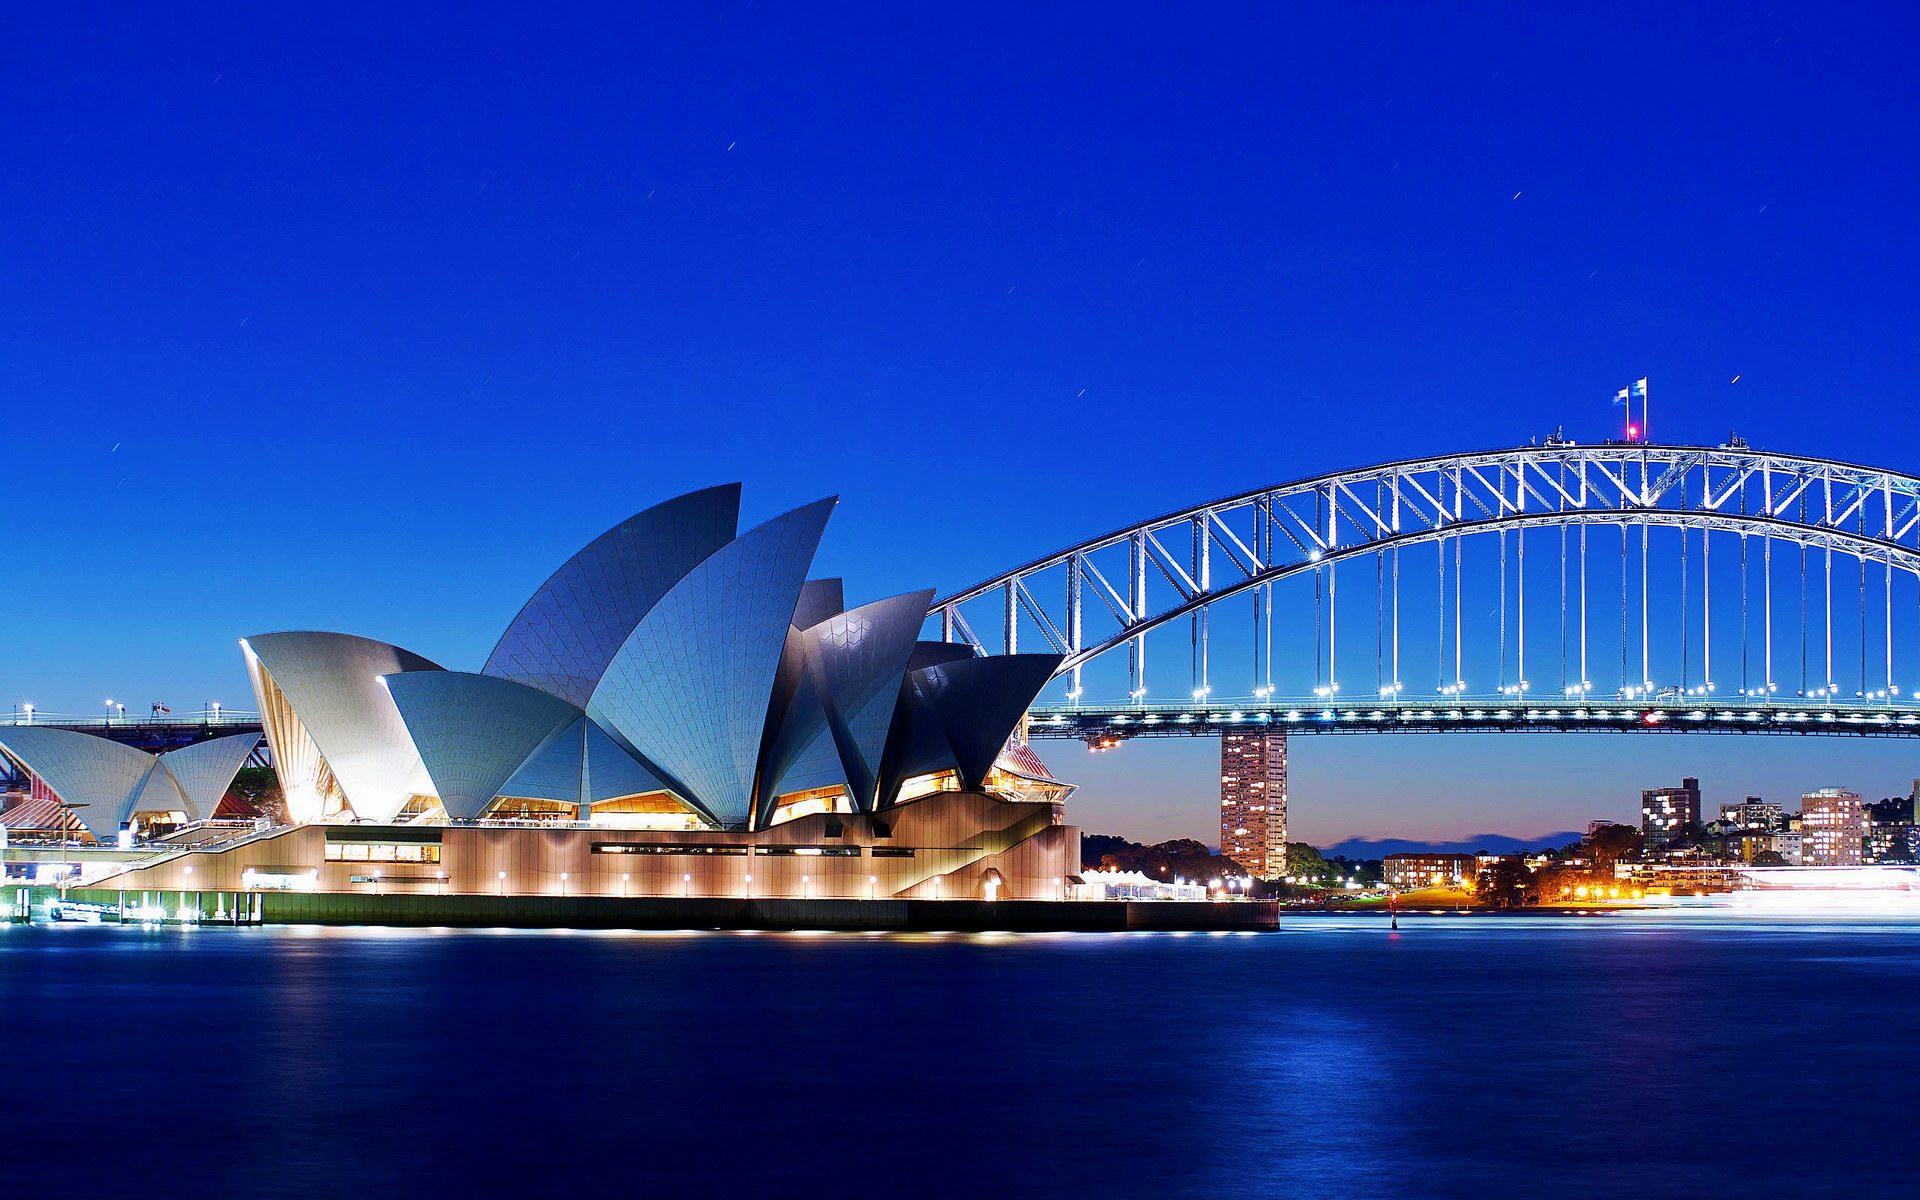 Sydney Opera House and Bridge Wallpaper   Travel HD Wallpapers 1920x1200